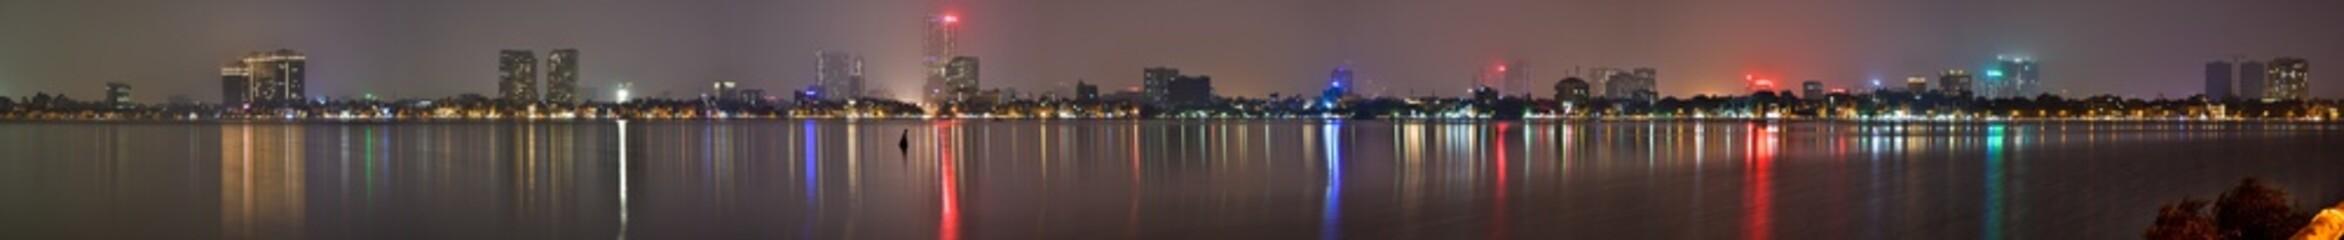 Hanoi skyline at night from West Lake.